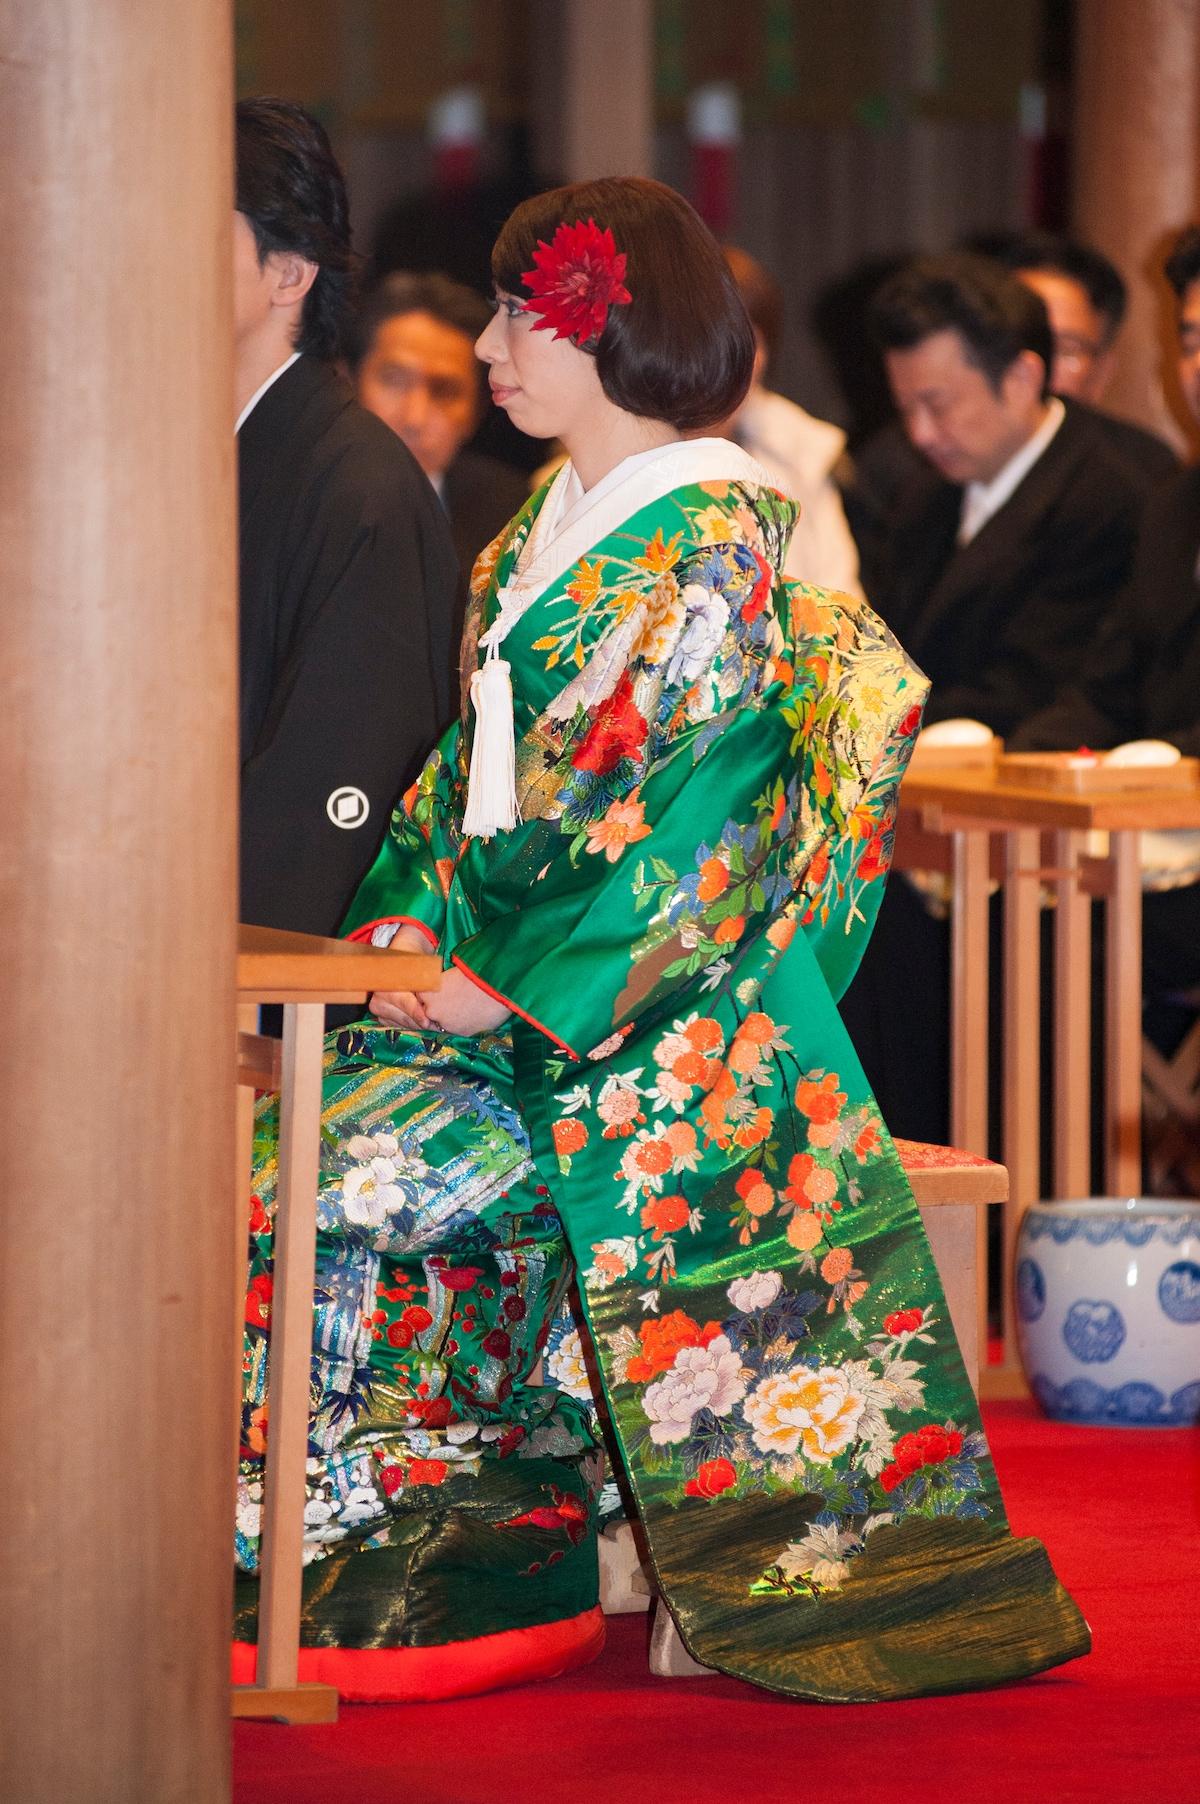 Yoshi From Taito, Japan